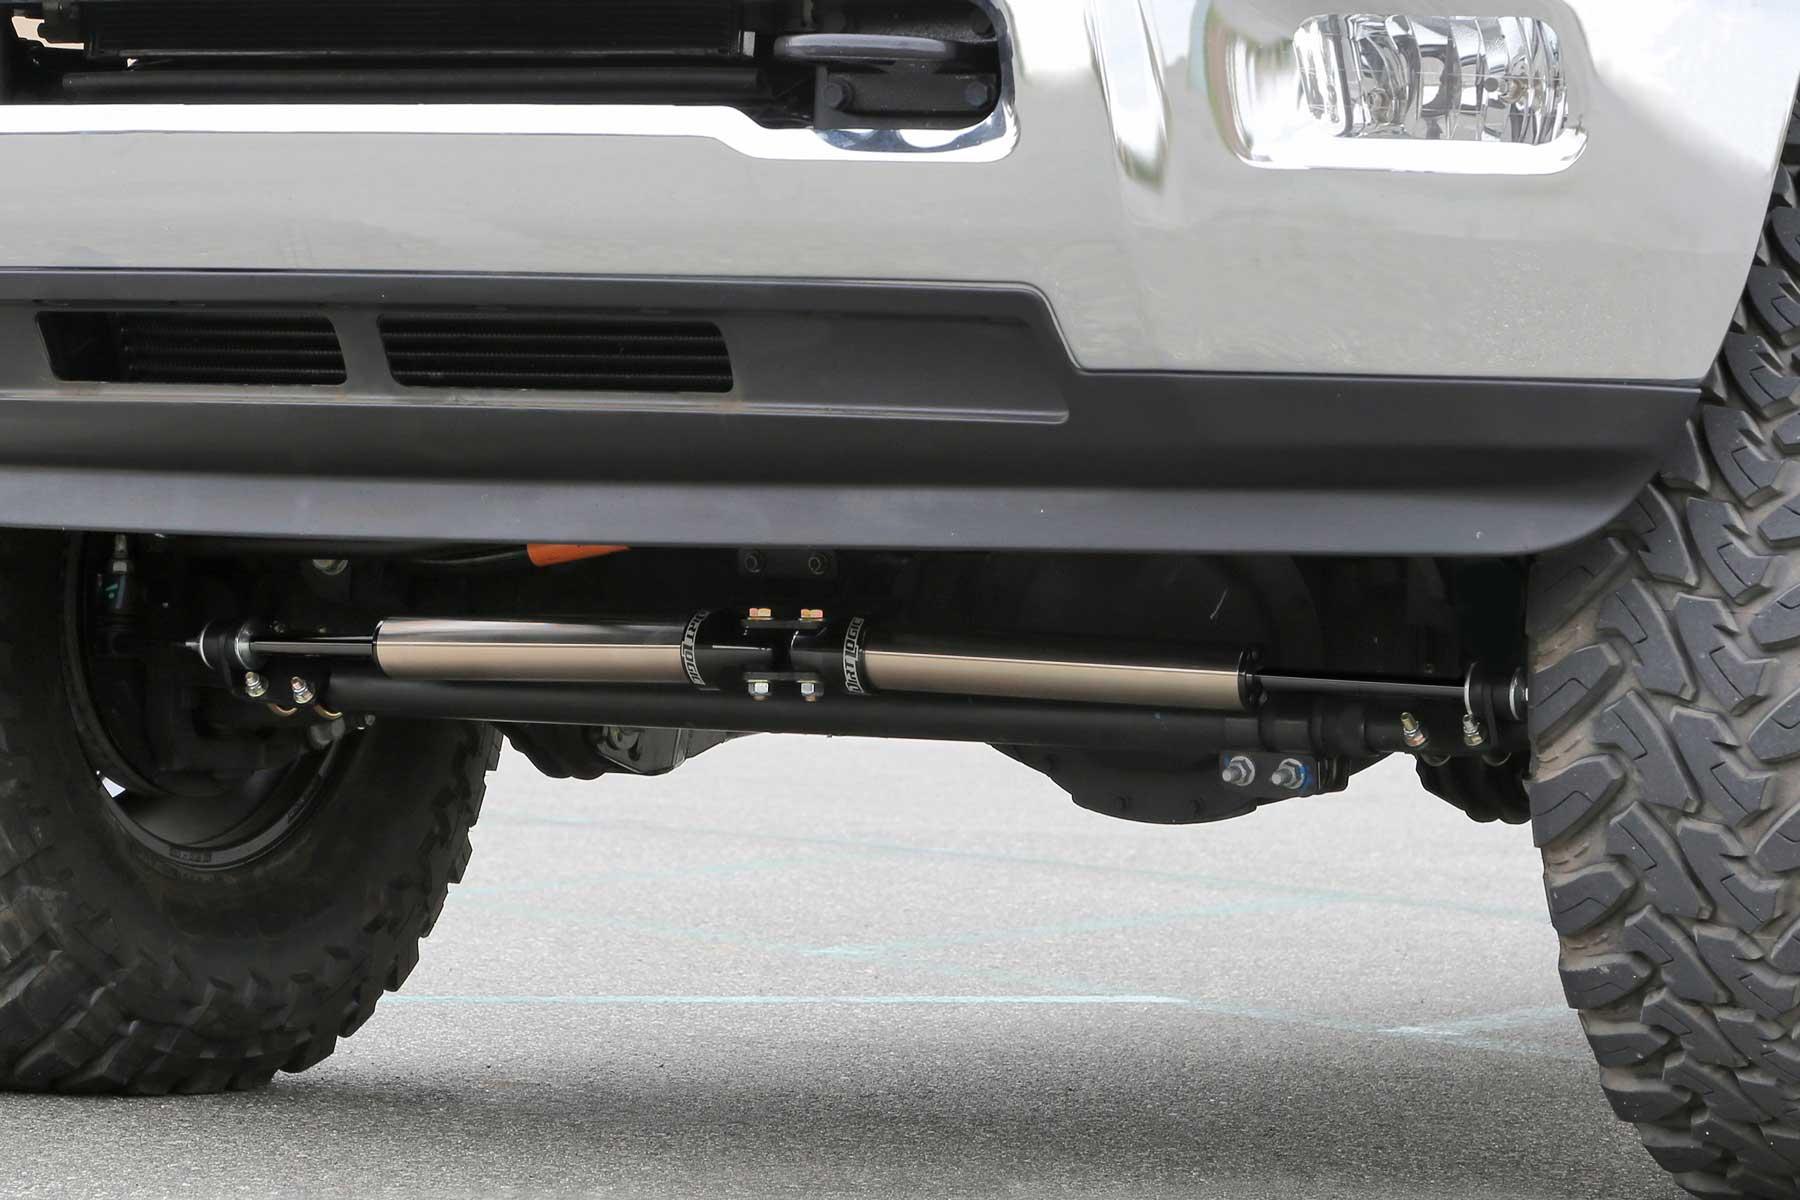 Dual Steering Stabilizer System w/ Dirt Logic 2 25 Shocks - FTS23164 |  Fabtech®